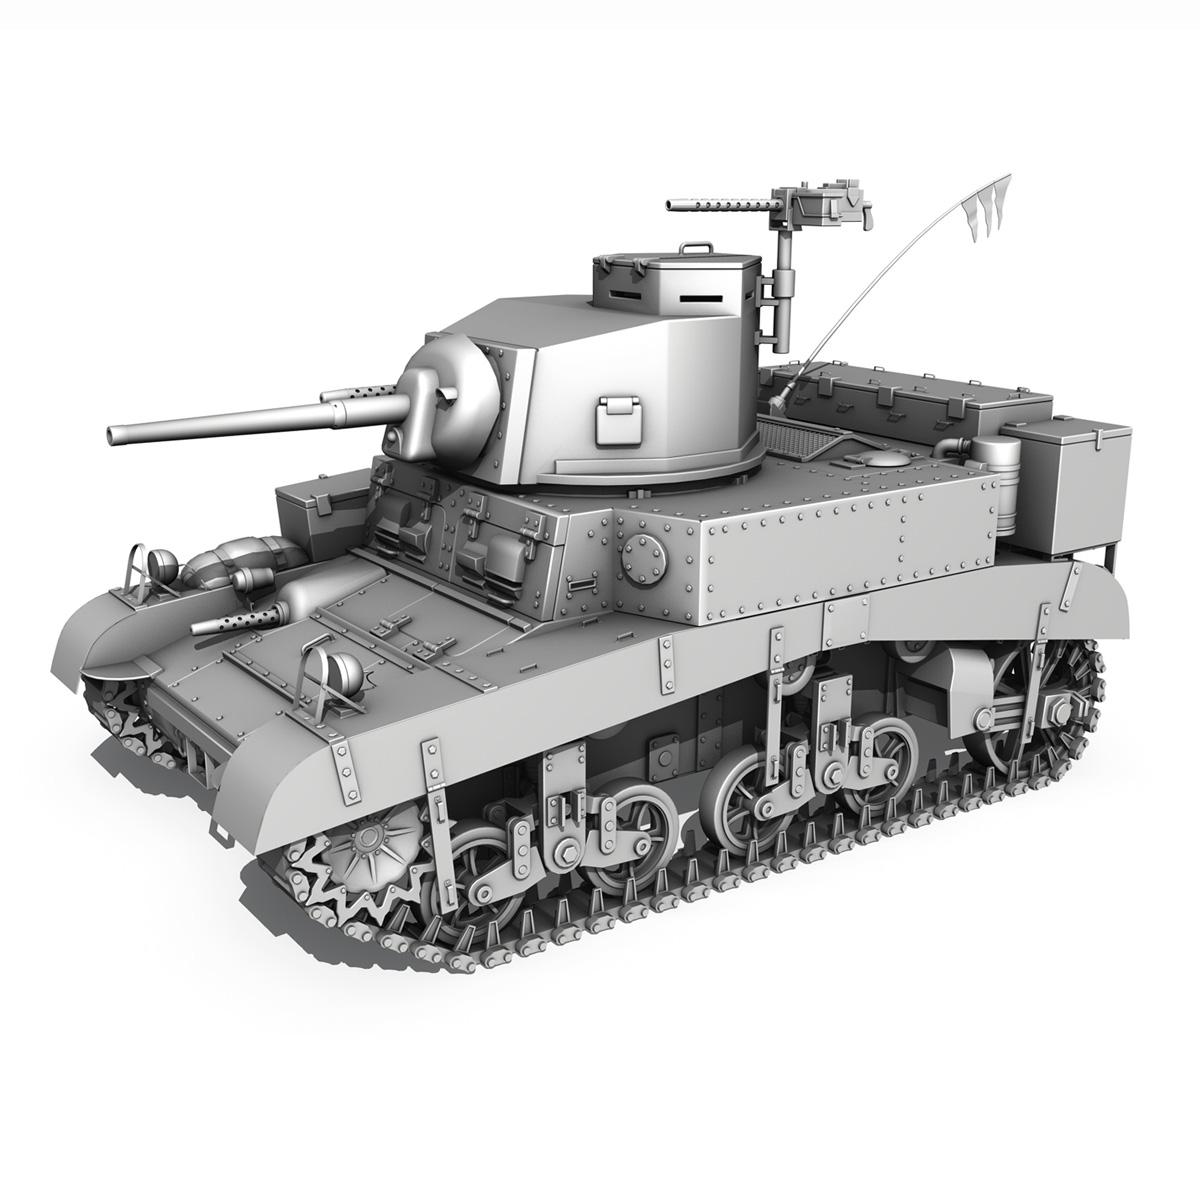 m3 light tank honey – bellman 3d model 3ds fbx c4d lwo obj 220720